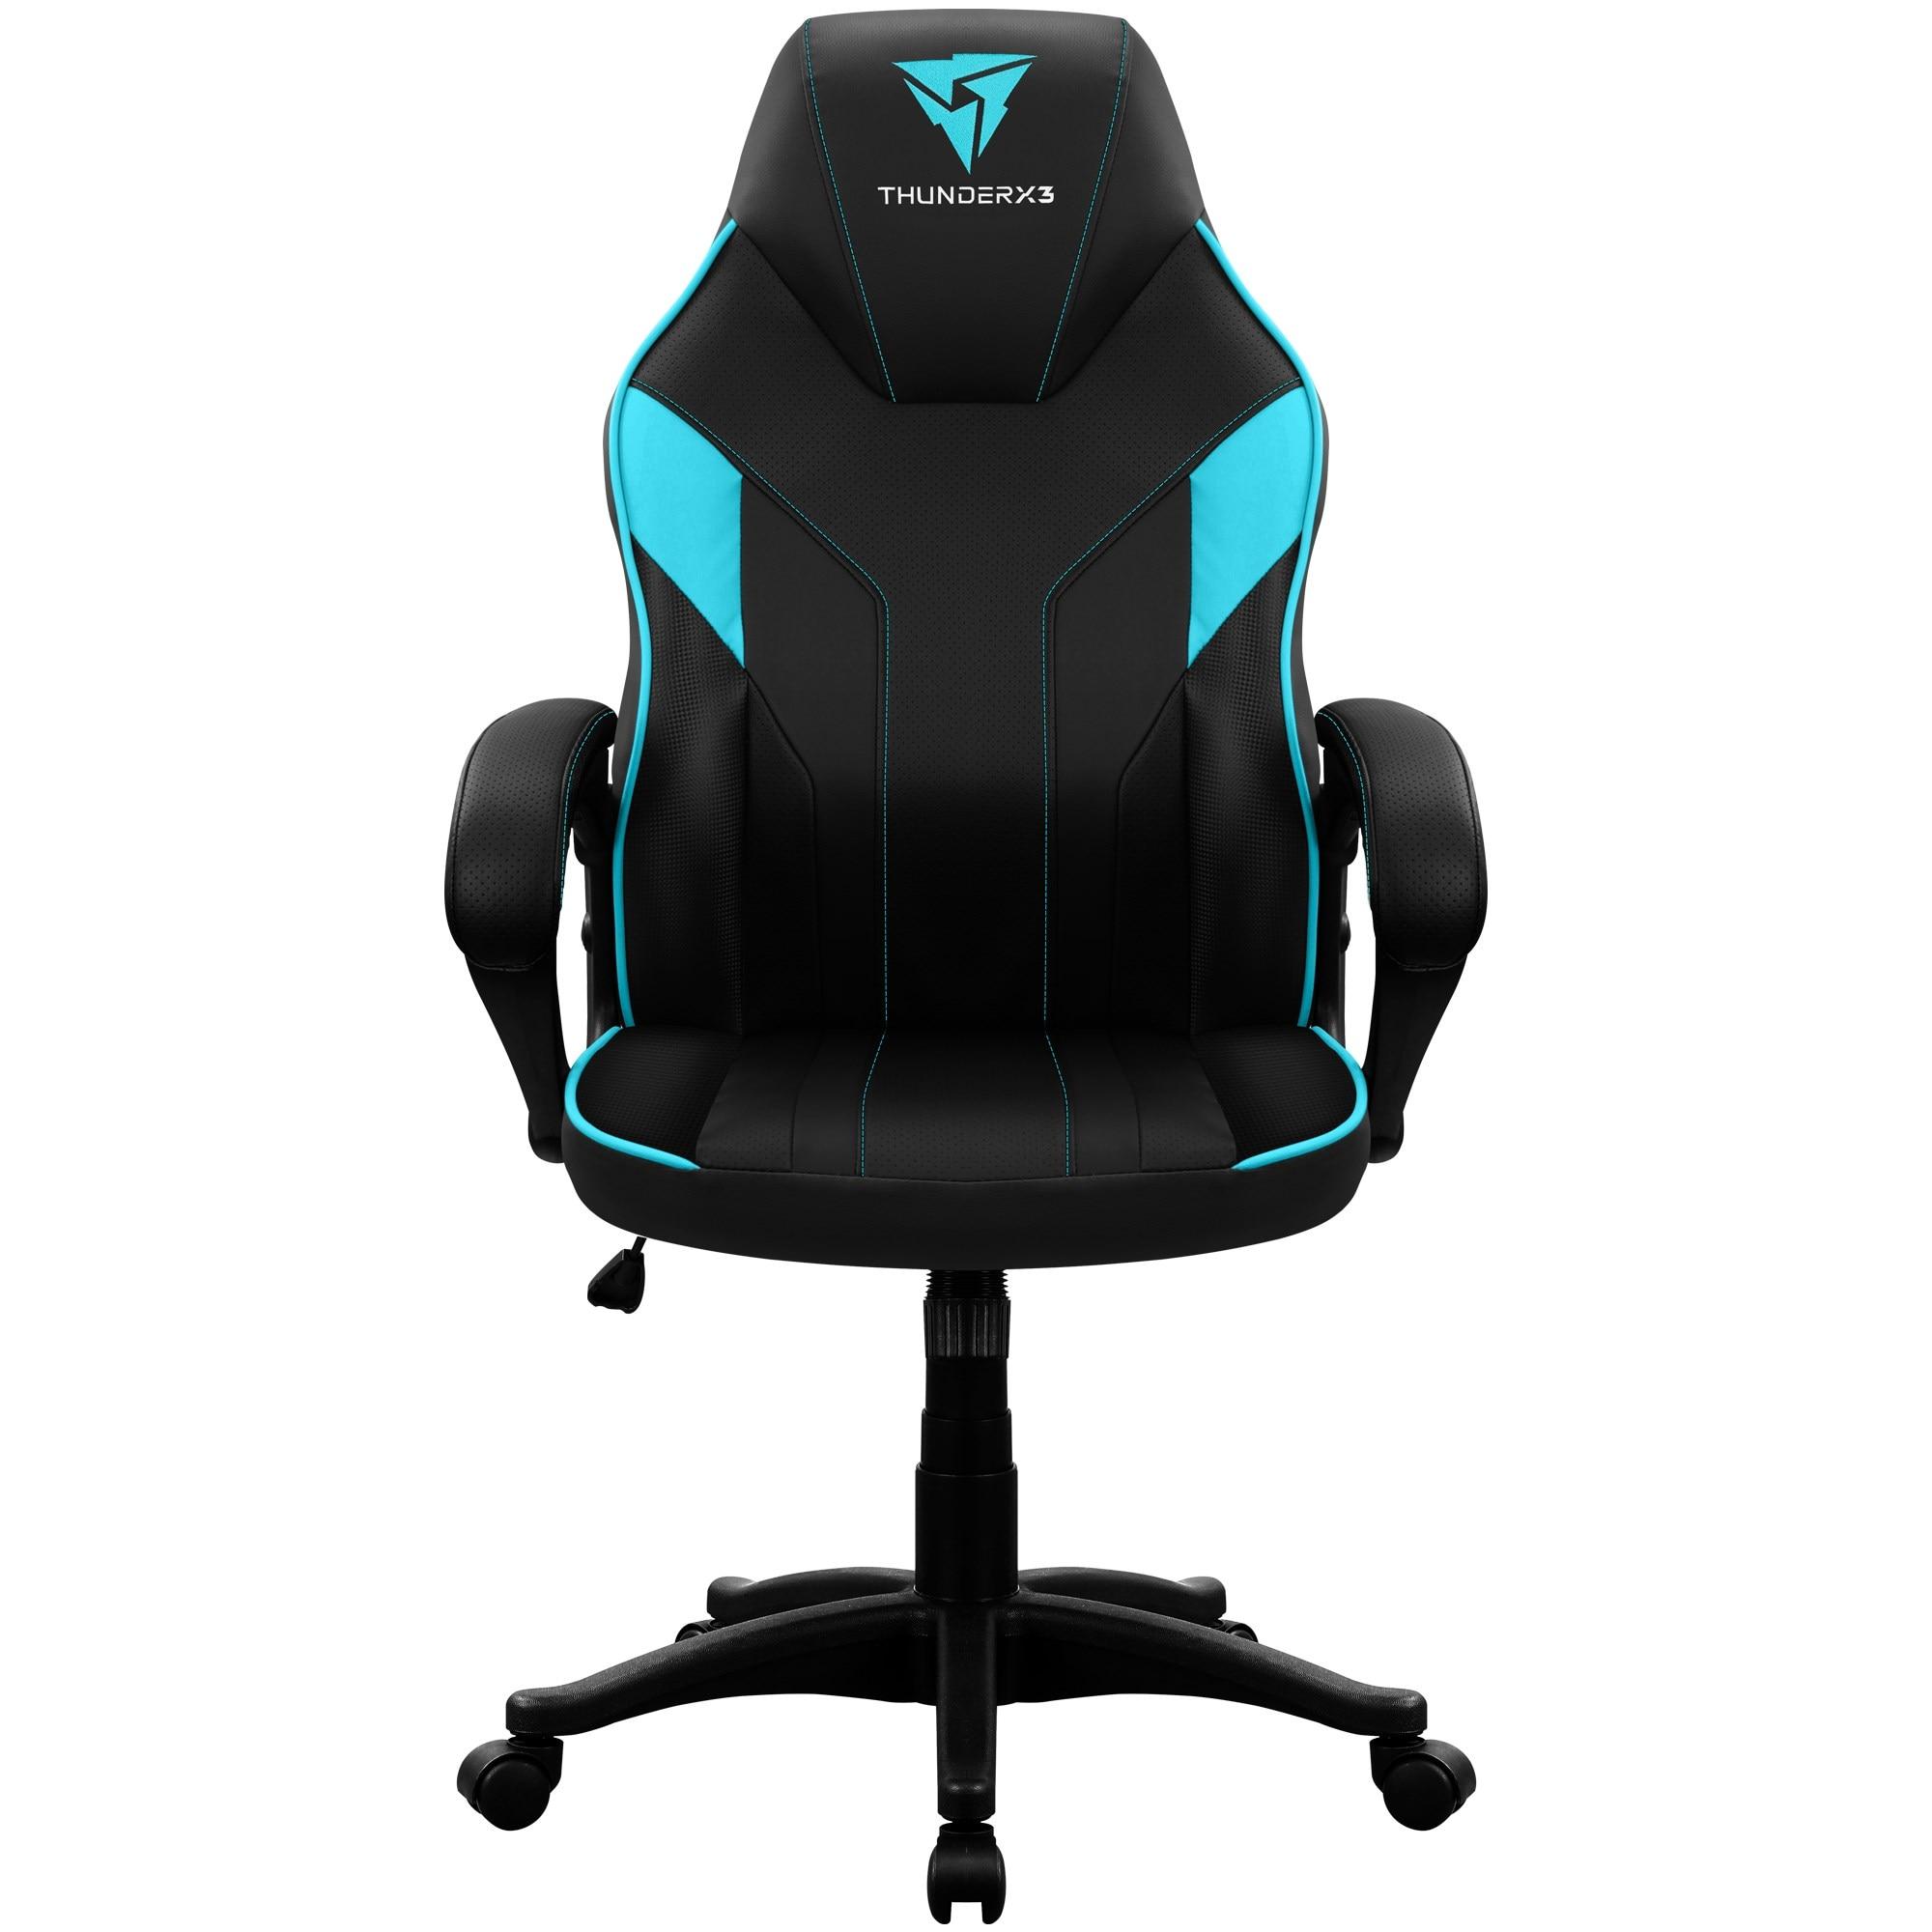 ThunderX3 EC1, Chair Gaming Ergonomic, Technology AIR, Armrest Padded, Adjustable Height, Cyan